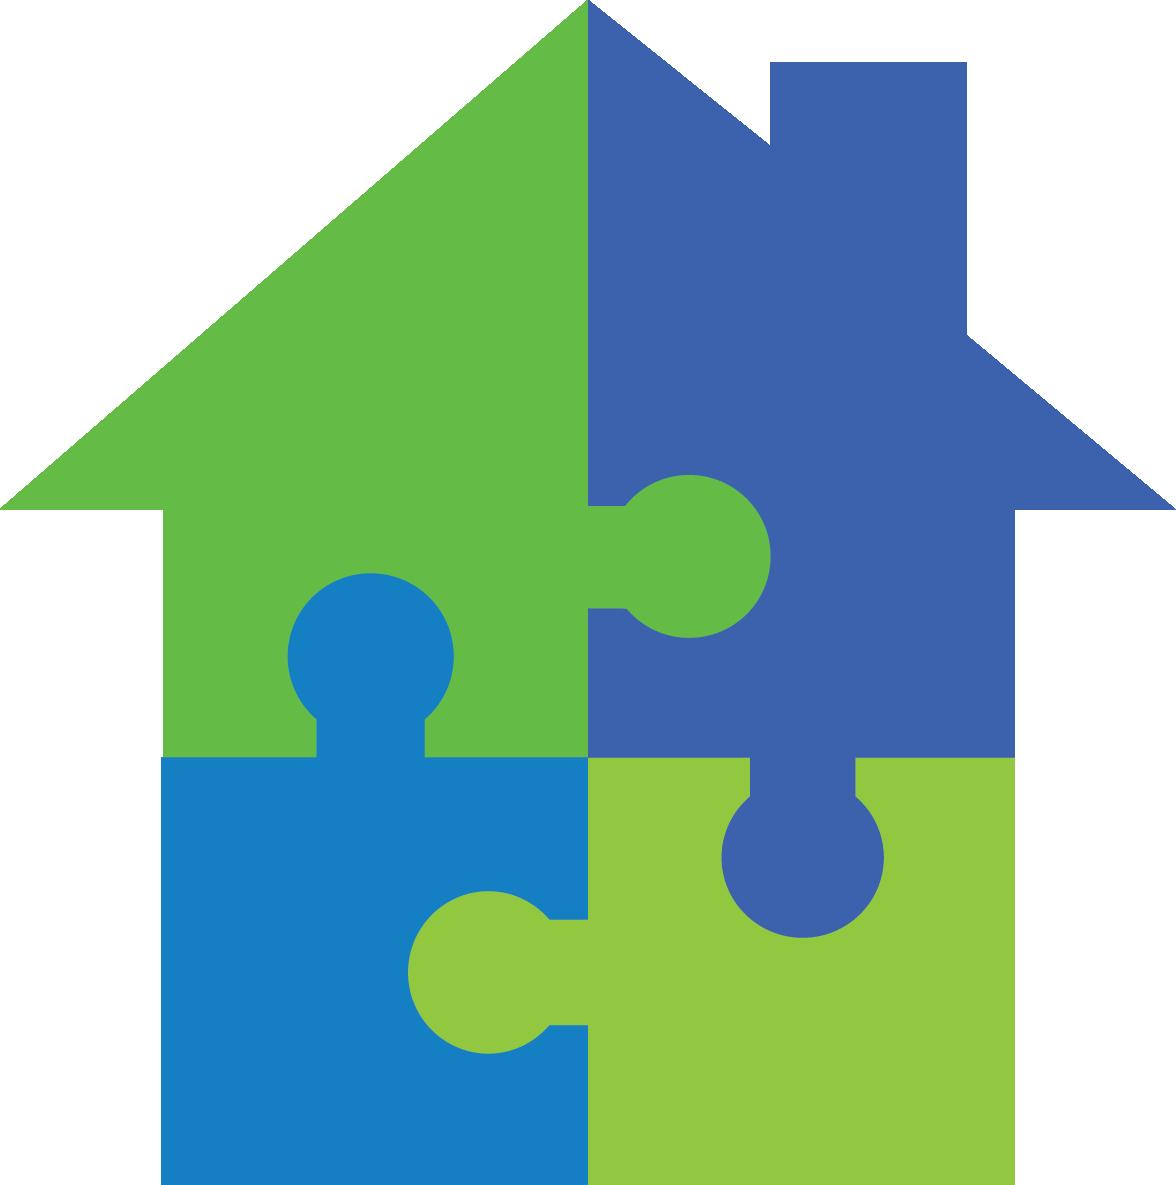 Evidence clipart assessment evaluation. Neurodevelopmental clinic autism center